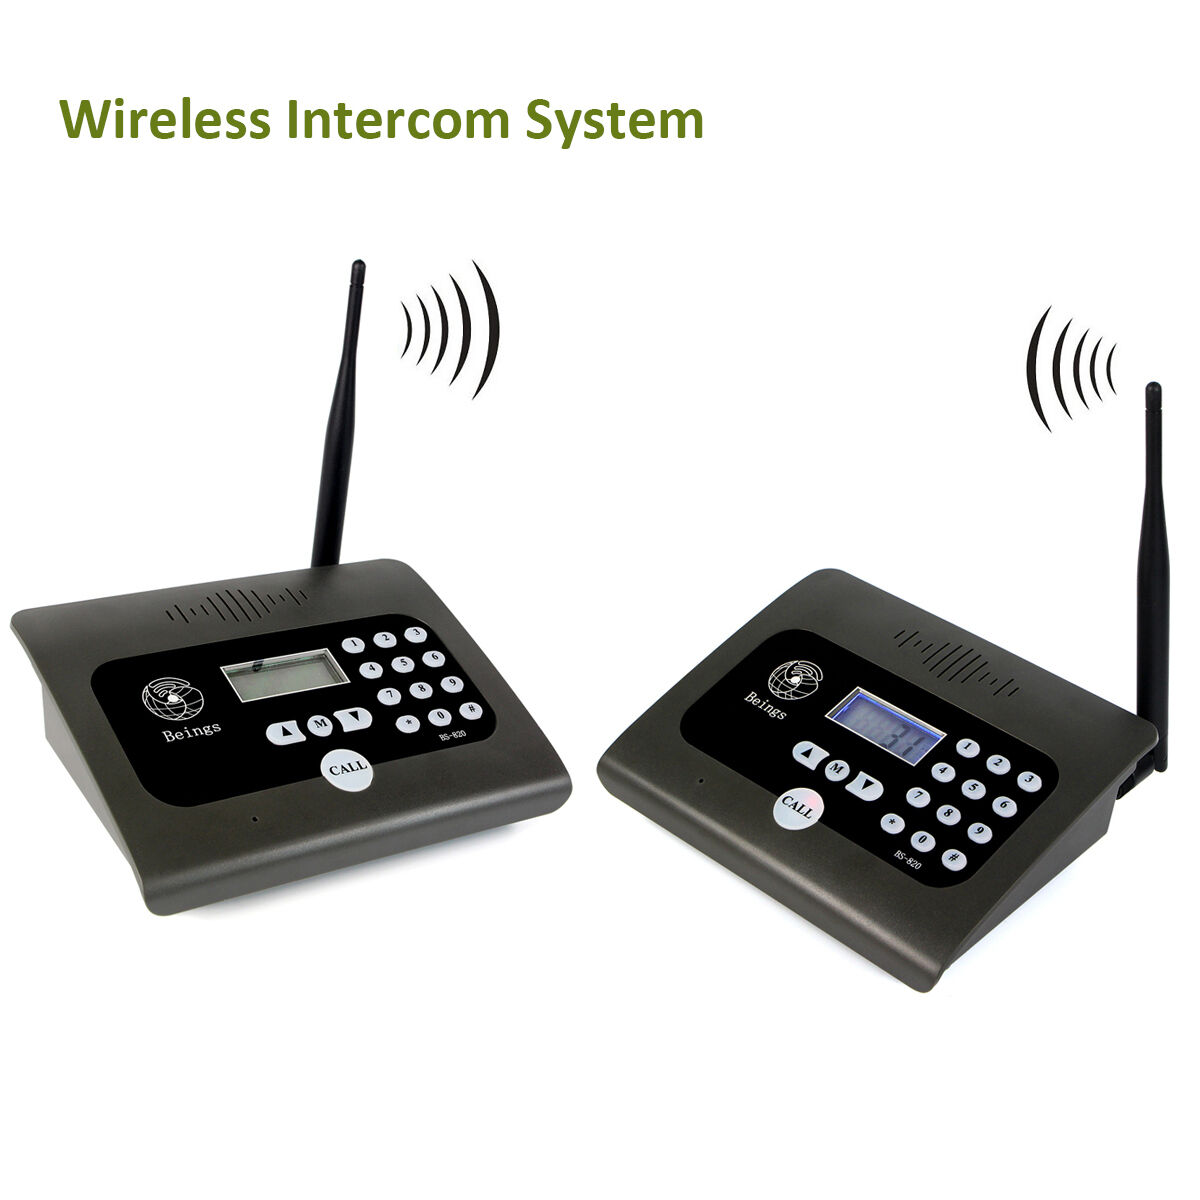 2pcs Full Duplex Home Indoor Wireless Voice Calling Intercom System w/ Antennas